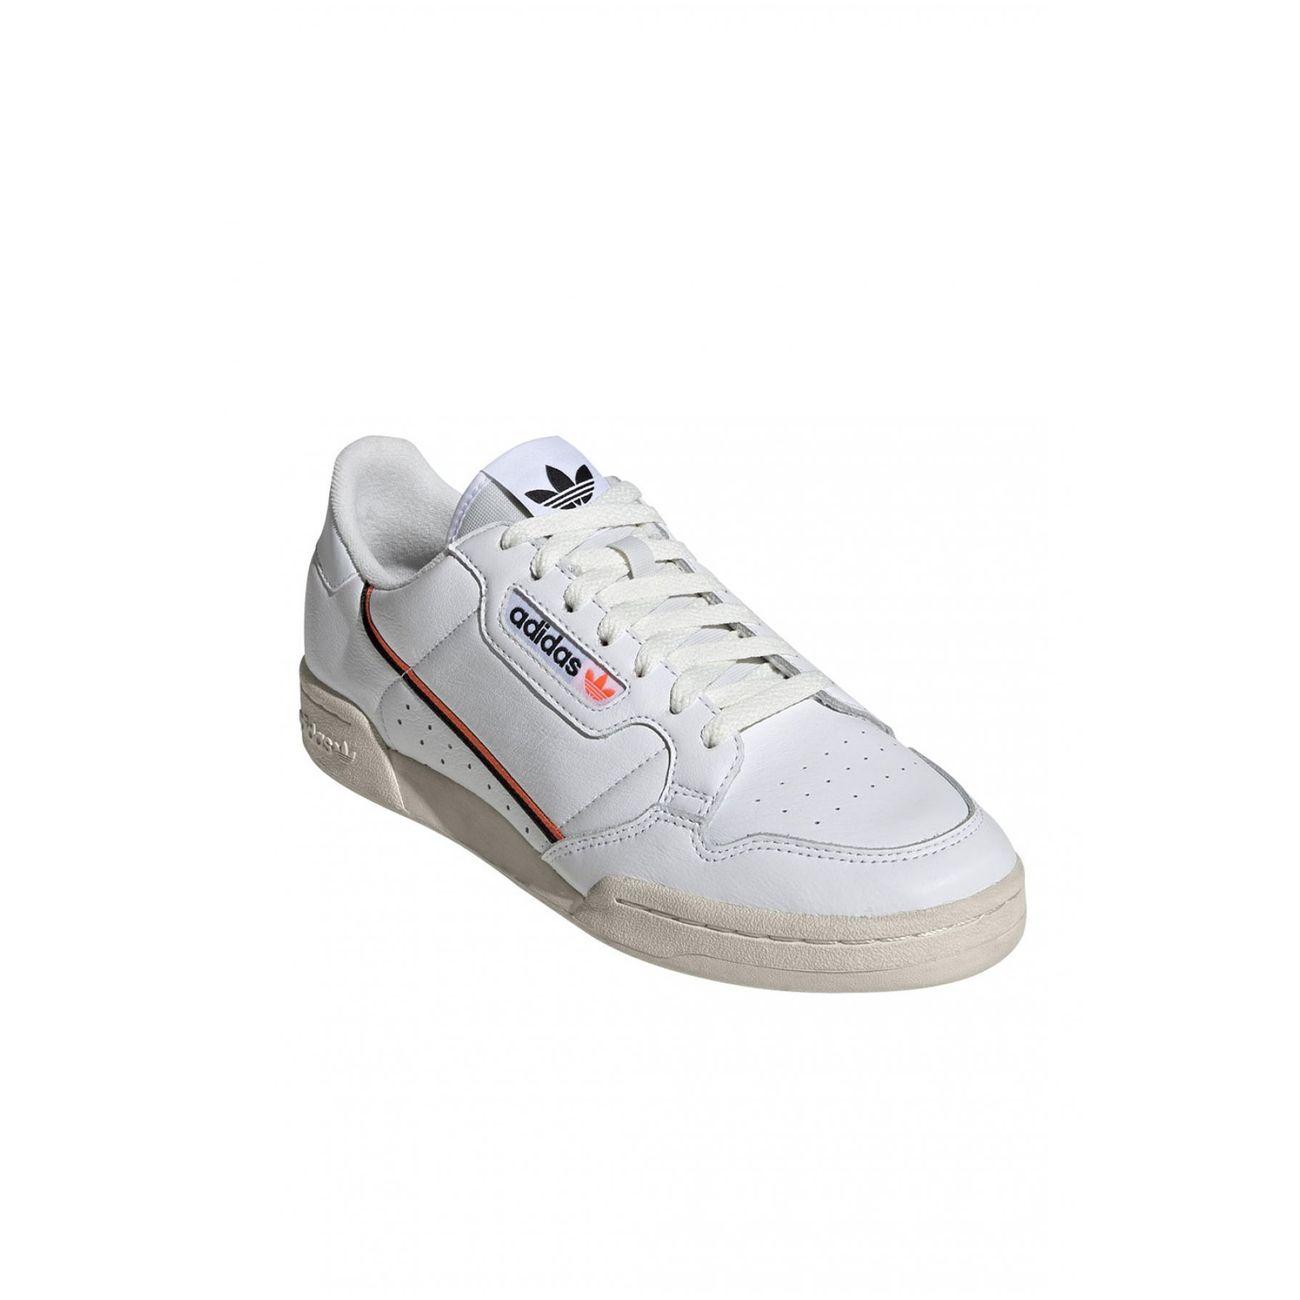 homme ADIDAS Sneakers en cuir Continental 80 - Adidas - Homme